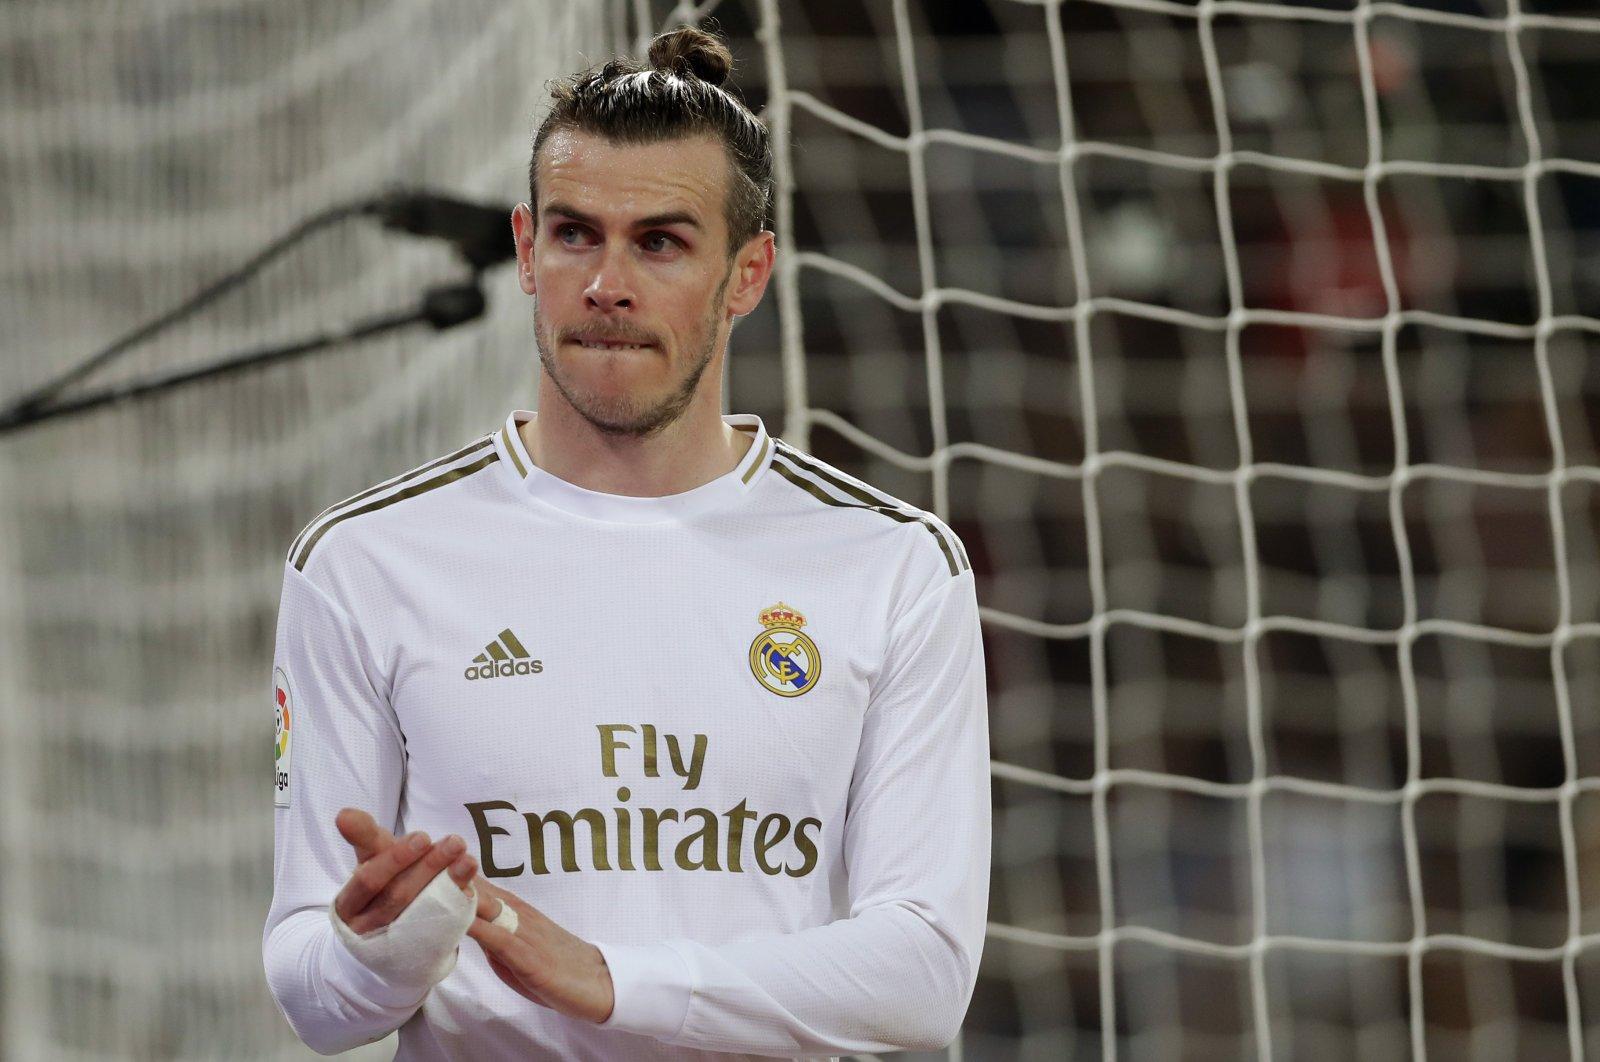 Real Madrid's Gareth Bale reacts during a La Liga match against Celta de Vigo, in Madrid, Spain, Feb. 16, 2020. (AP Photo)